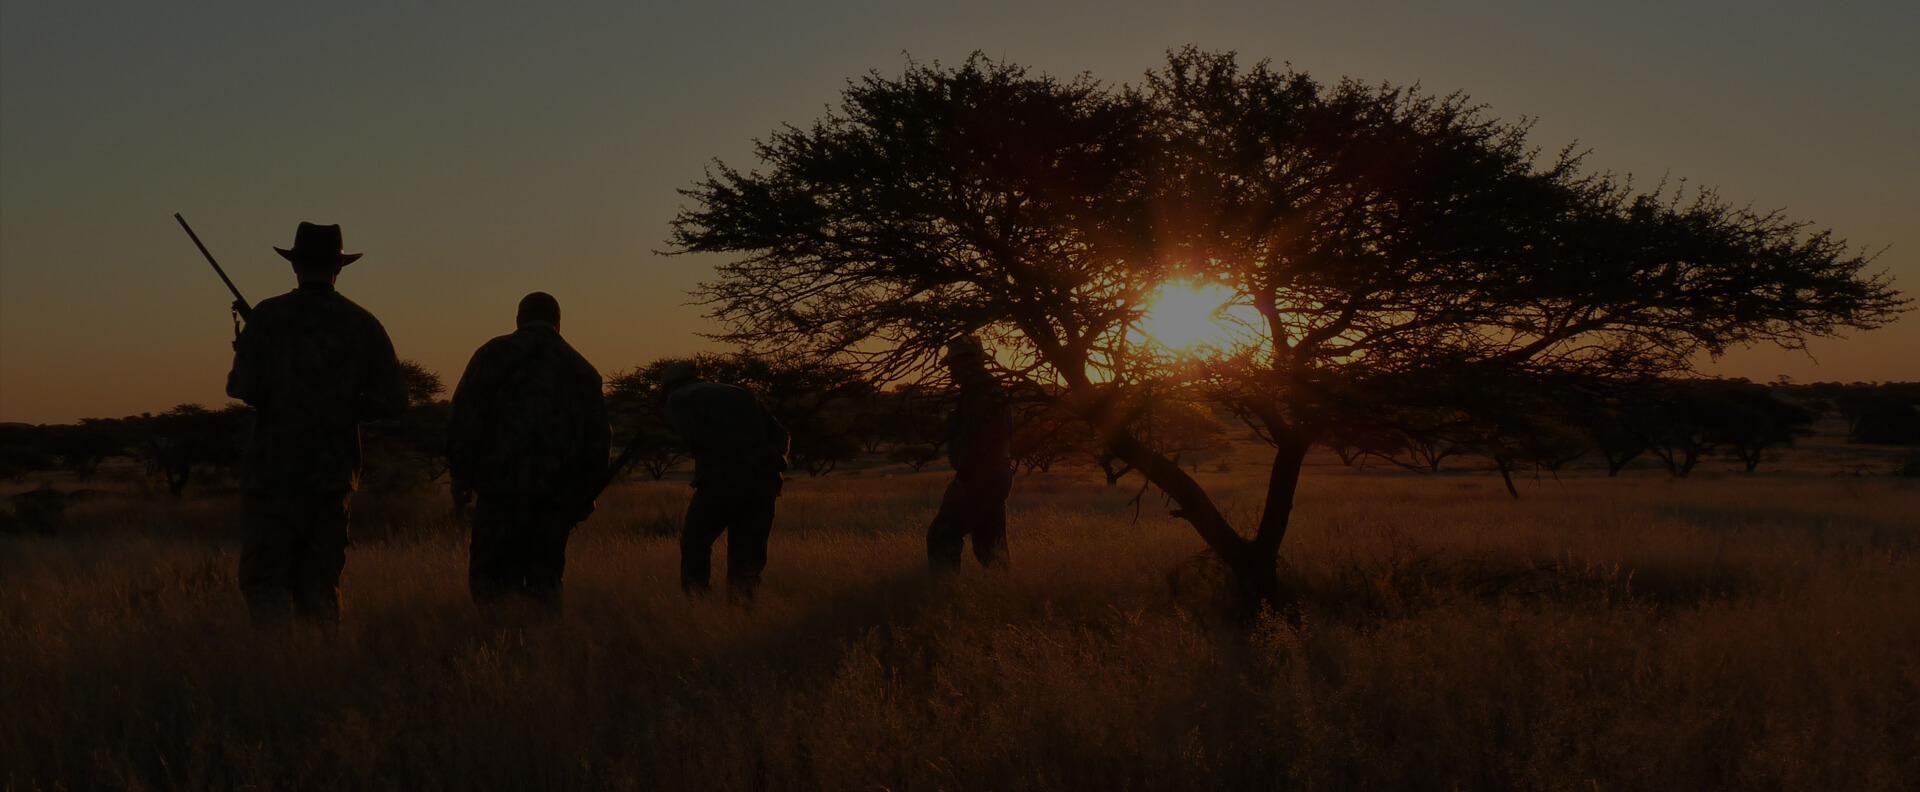 Wintershoek Safaris Zambia South Africa Zimbabwe Mozambique Cameroon Namibia Tanzania